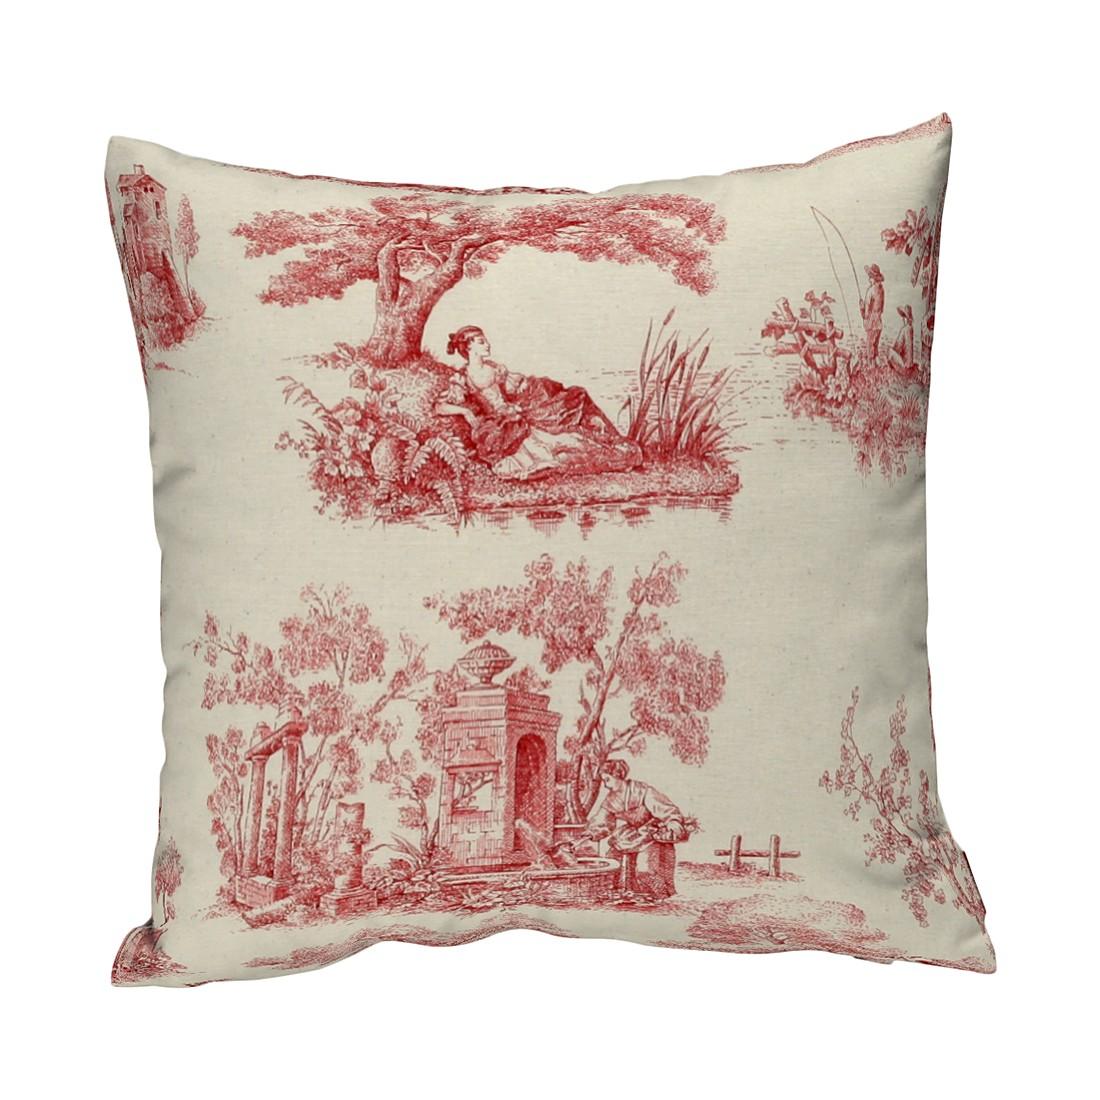 Home 24 - Housse de coussin - ecru / motif rouge - 60 x 60 cm, dekoria